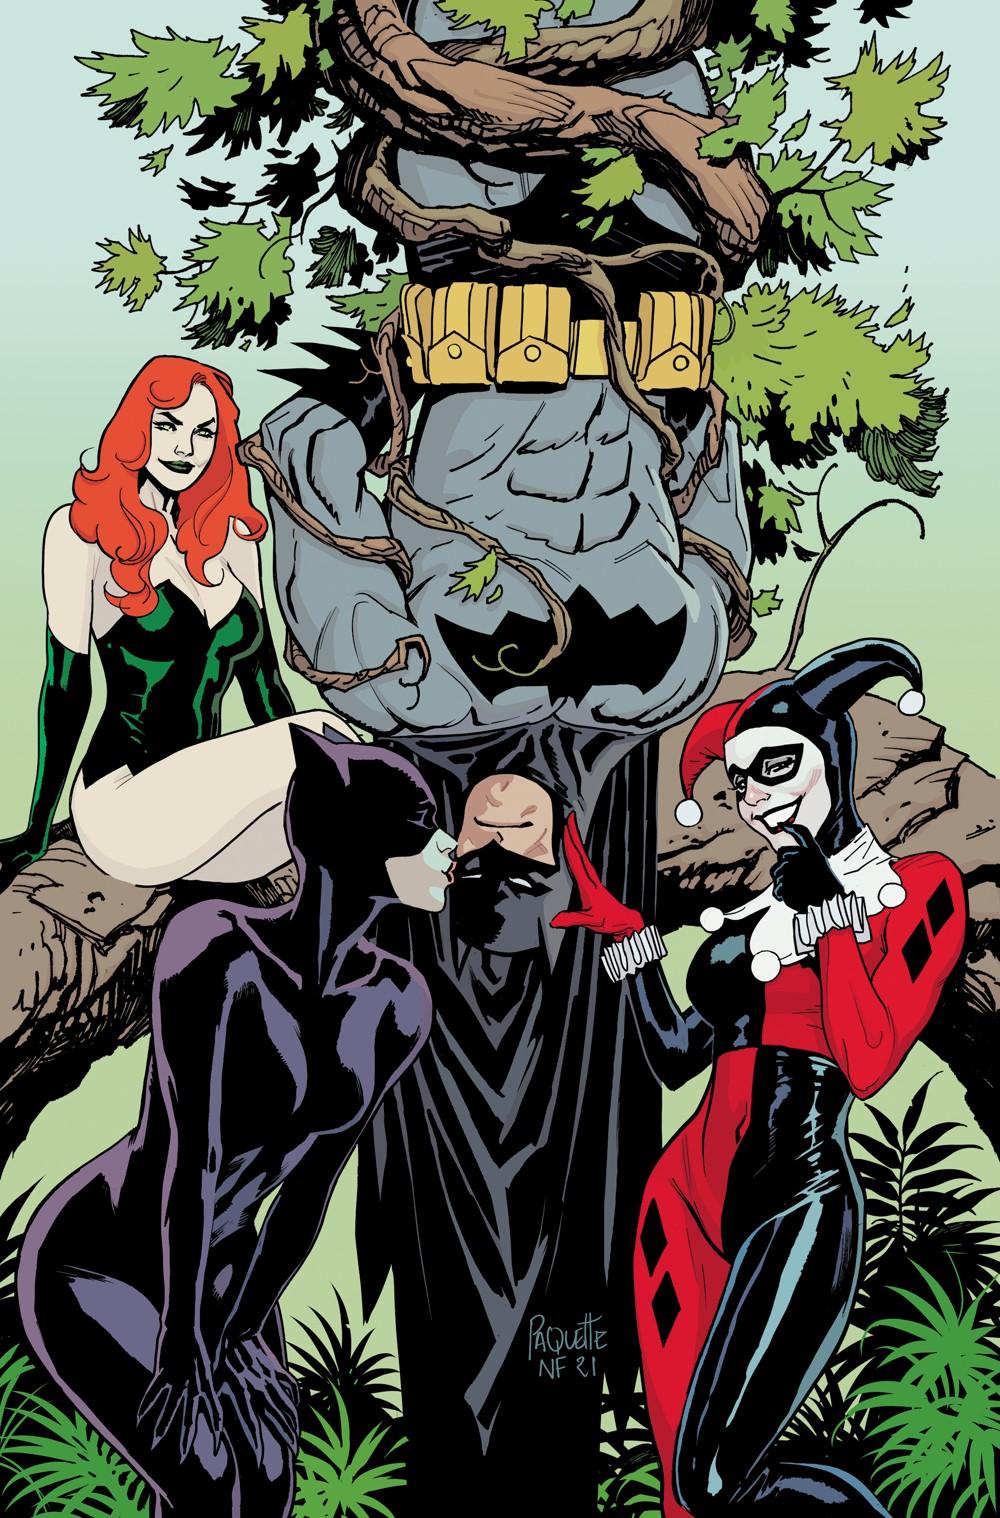 BTAC-Season-Two-6-Variant DC Comics November 2021 Solicitations